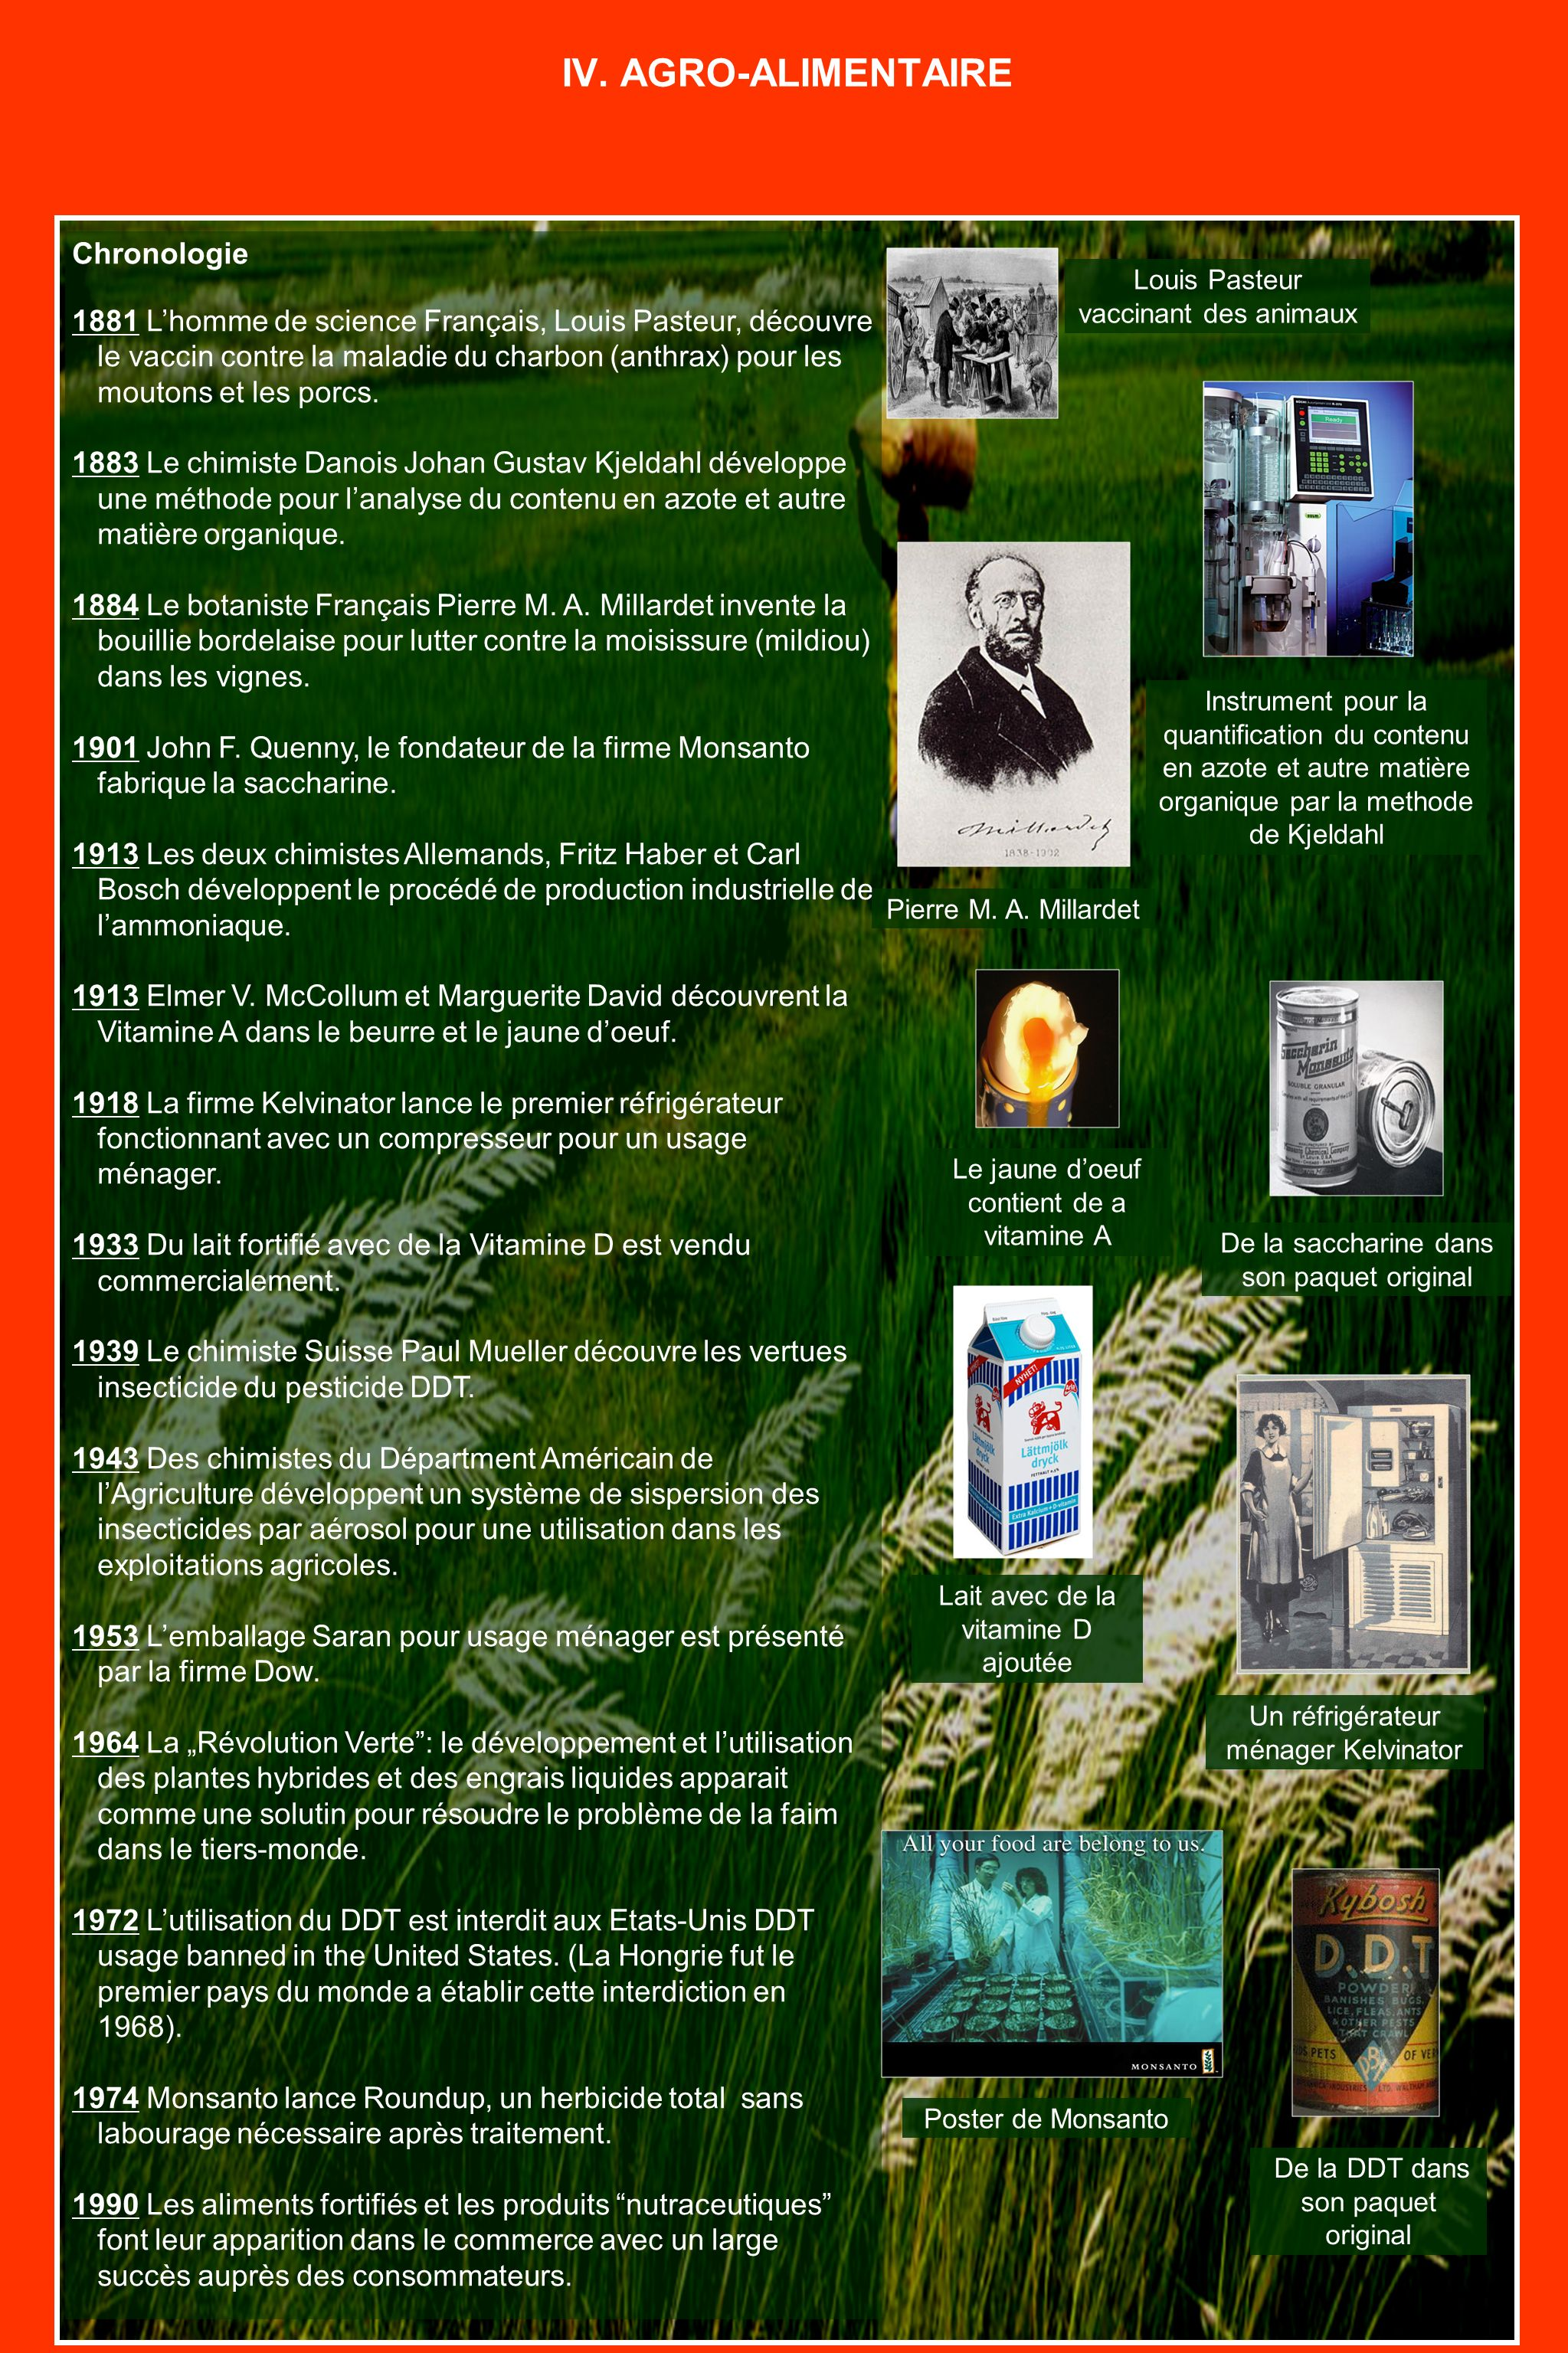 IV. AGRO-ALIMENTAIRE Chronologie